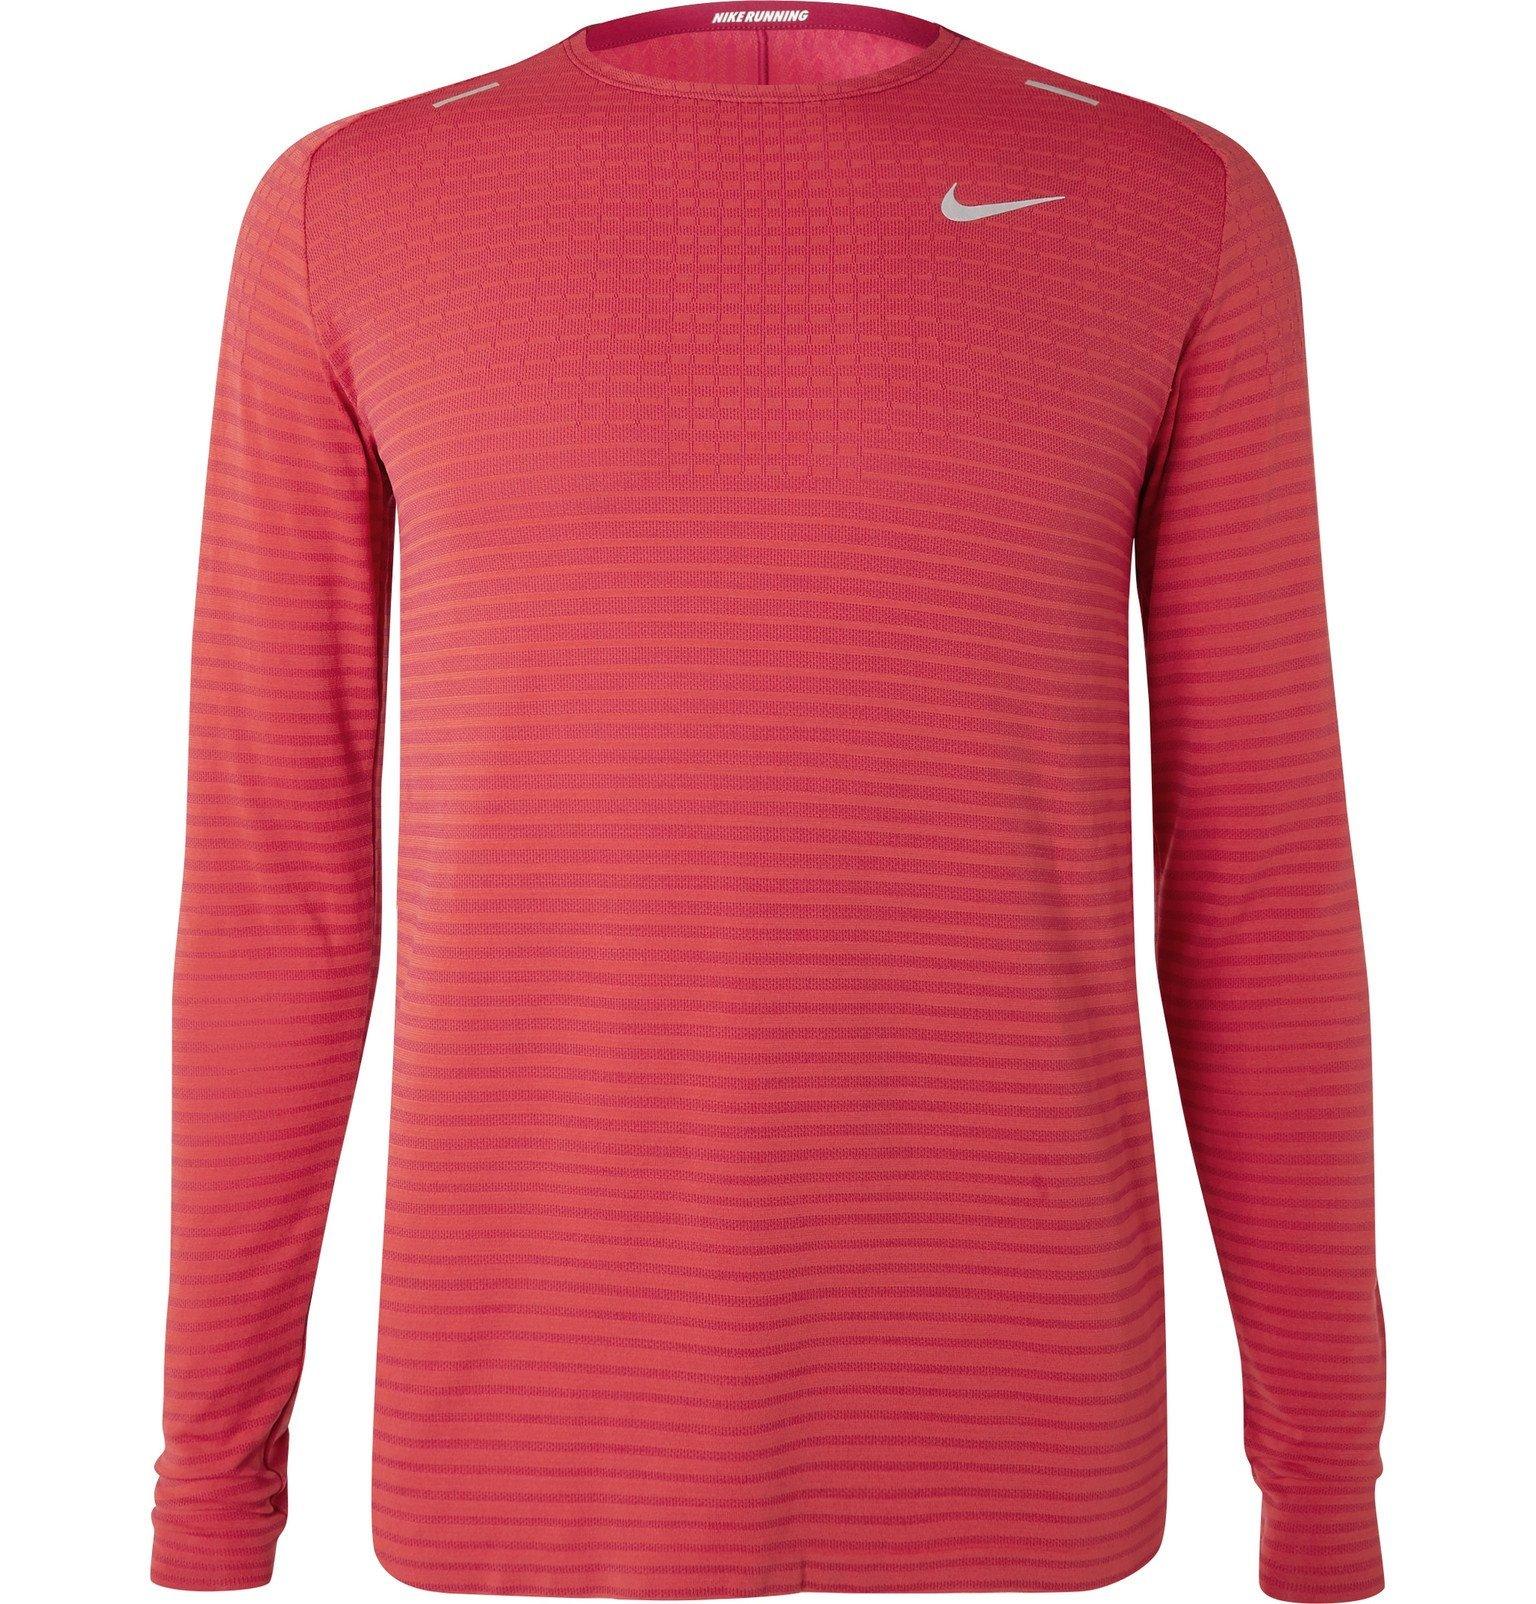 Nike Running - Ultra Slim-Fit TechKnit T-Shirt - Red